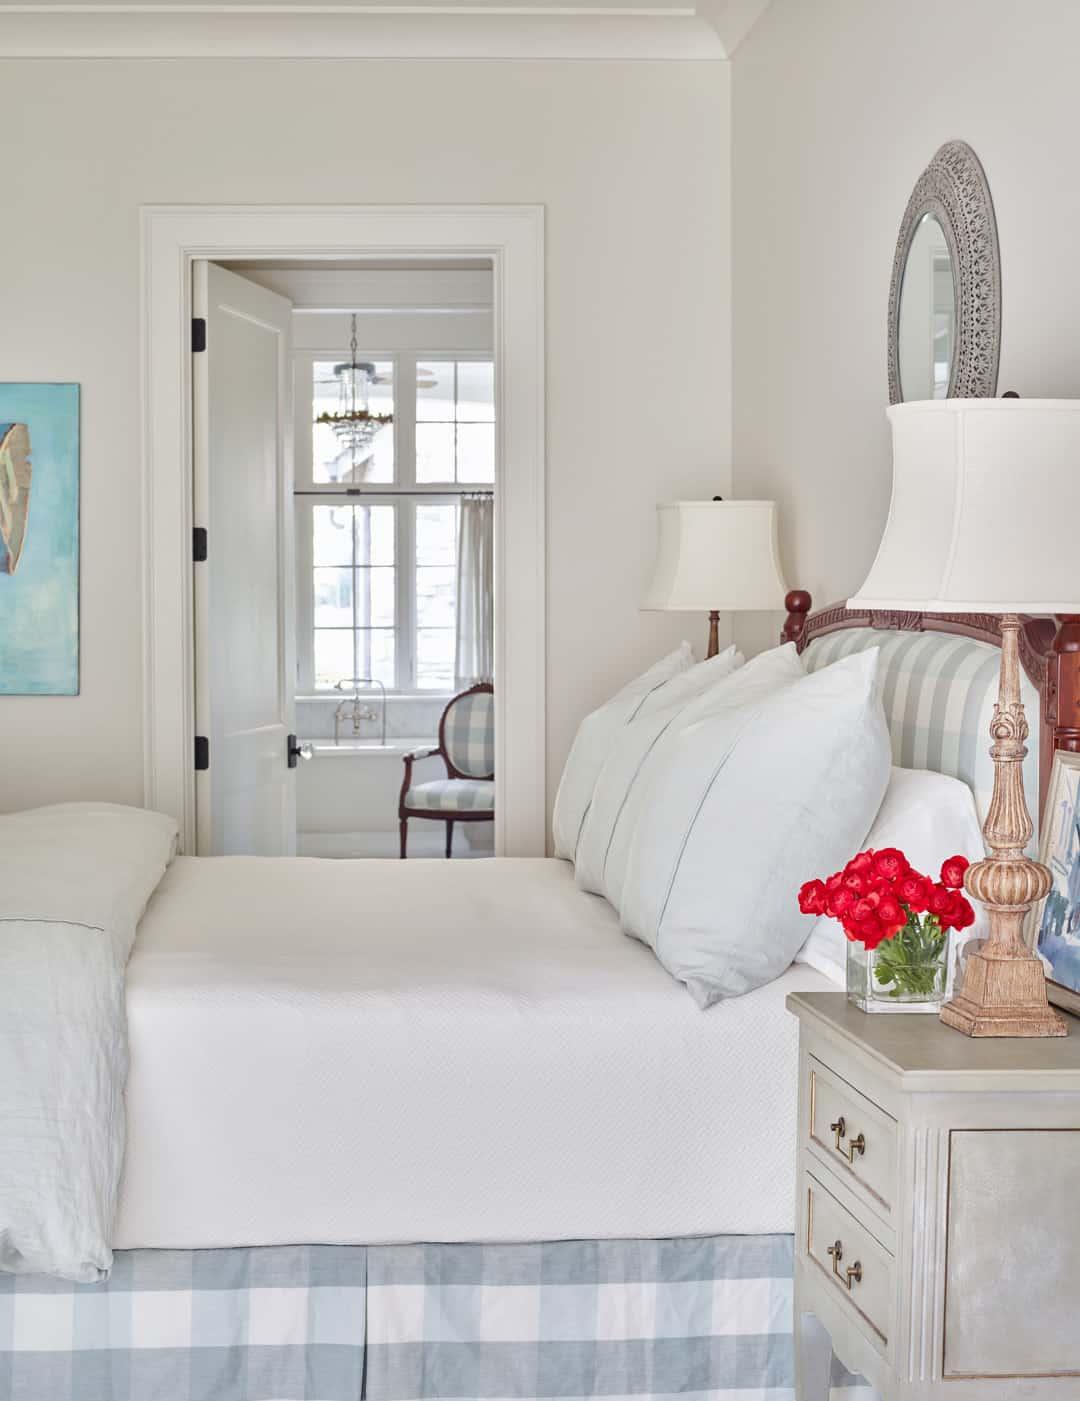 spavaća soba u europskom stilu